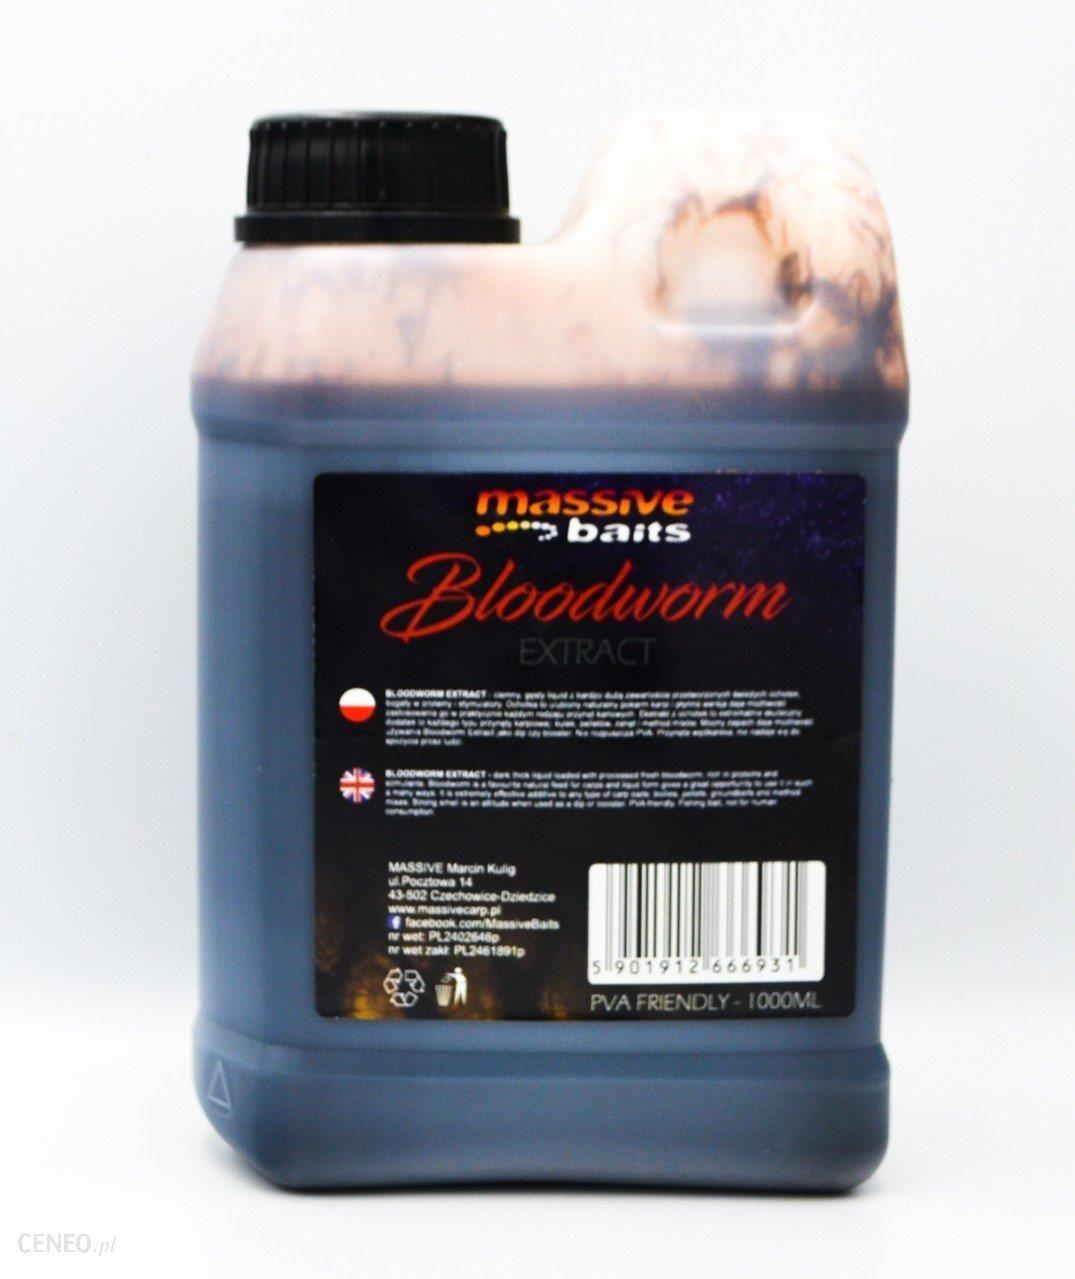 Massive Baits Bloodworm Extract Liquid